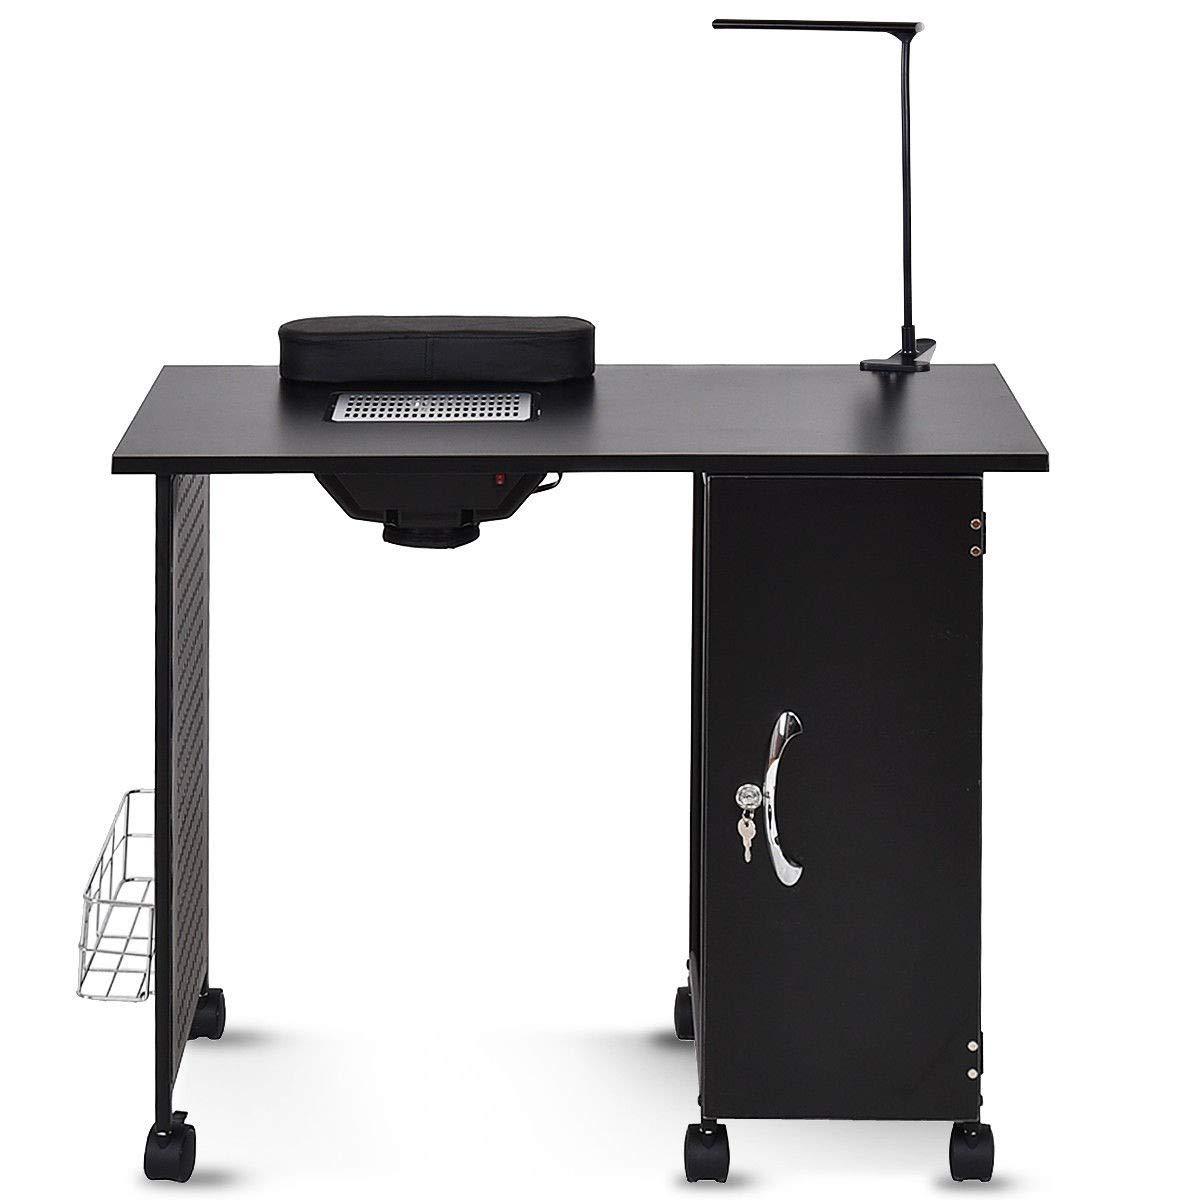 Manicure Table Nail Art Table Nail Station Desk Beauty Salon Steel Nail Equipment